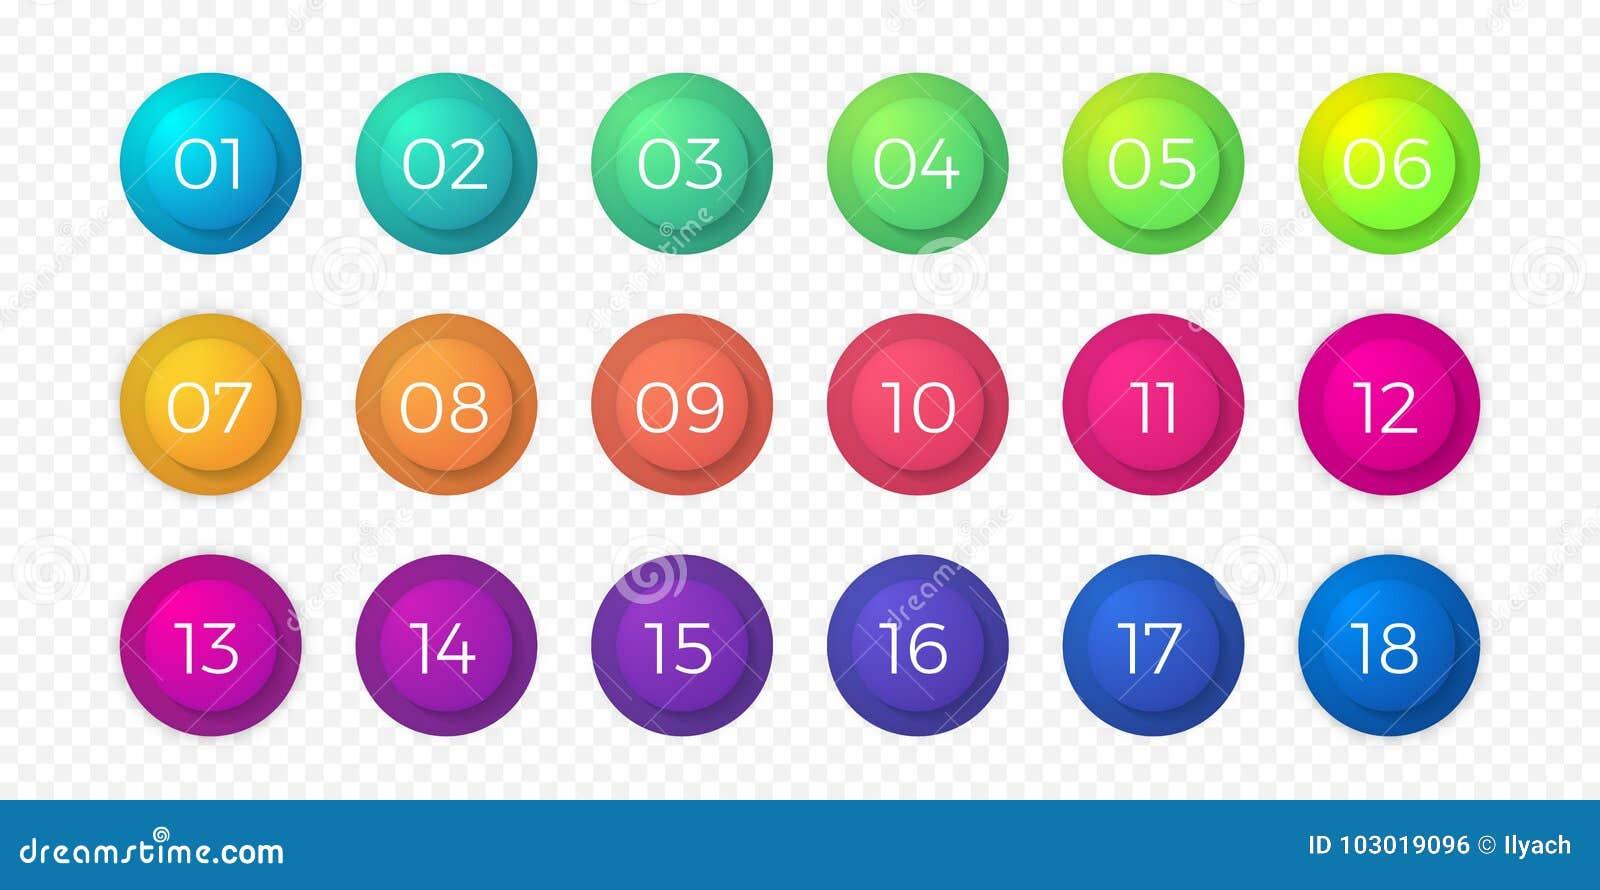 Пронумеруйте значки круга вектора кнопки сети градиента цвета пункта маркированного списка плоские